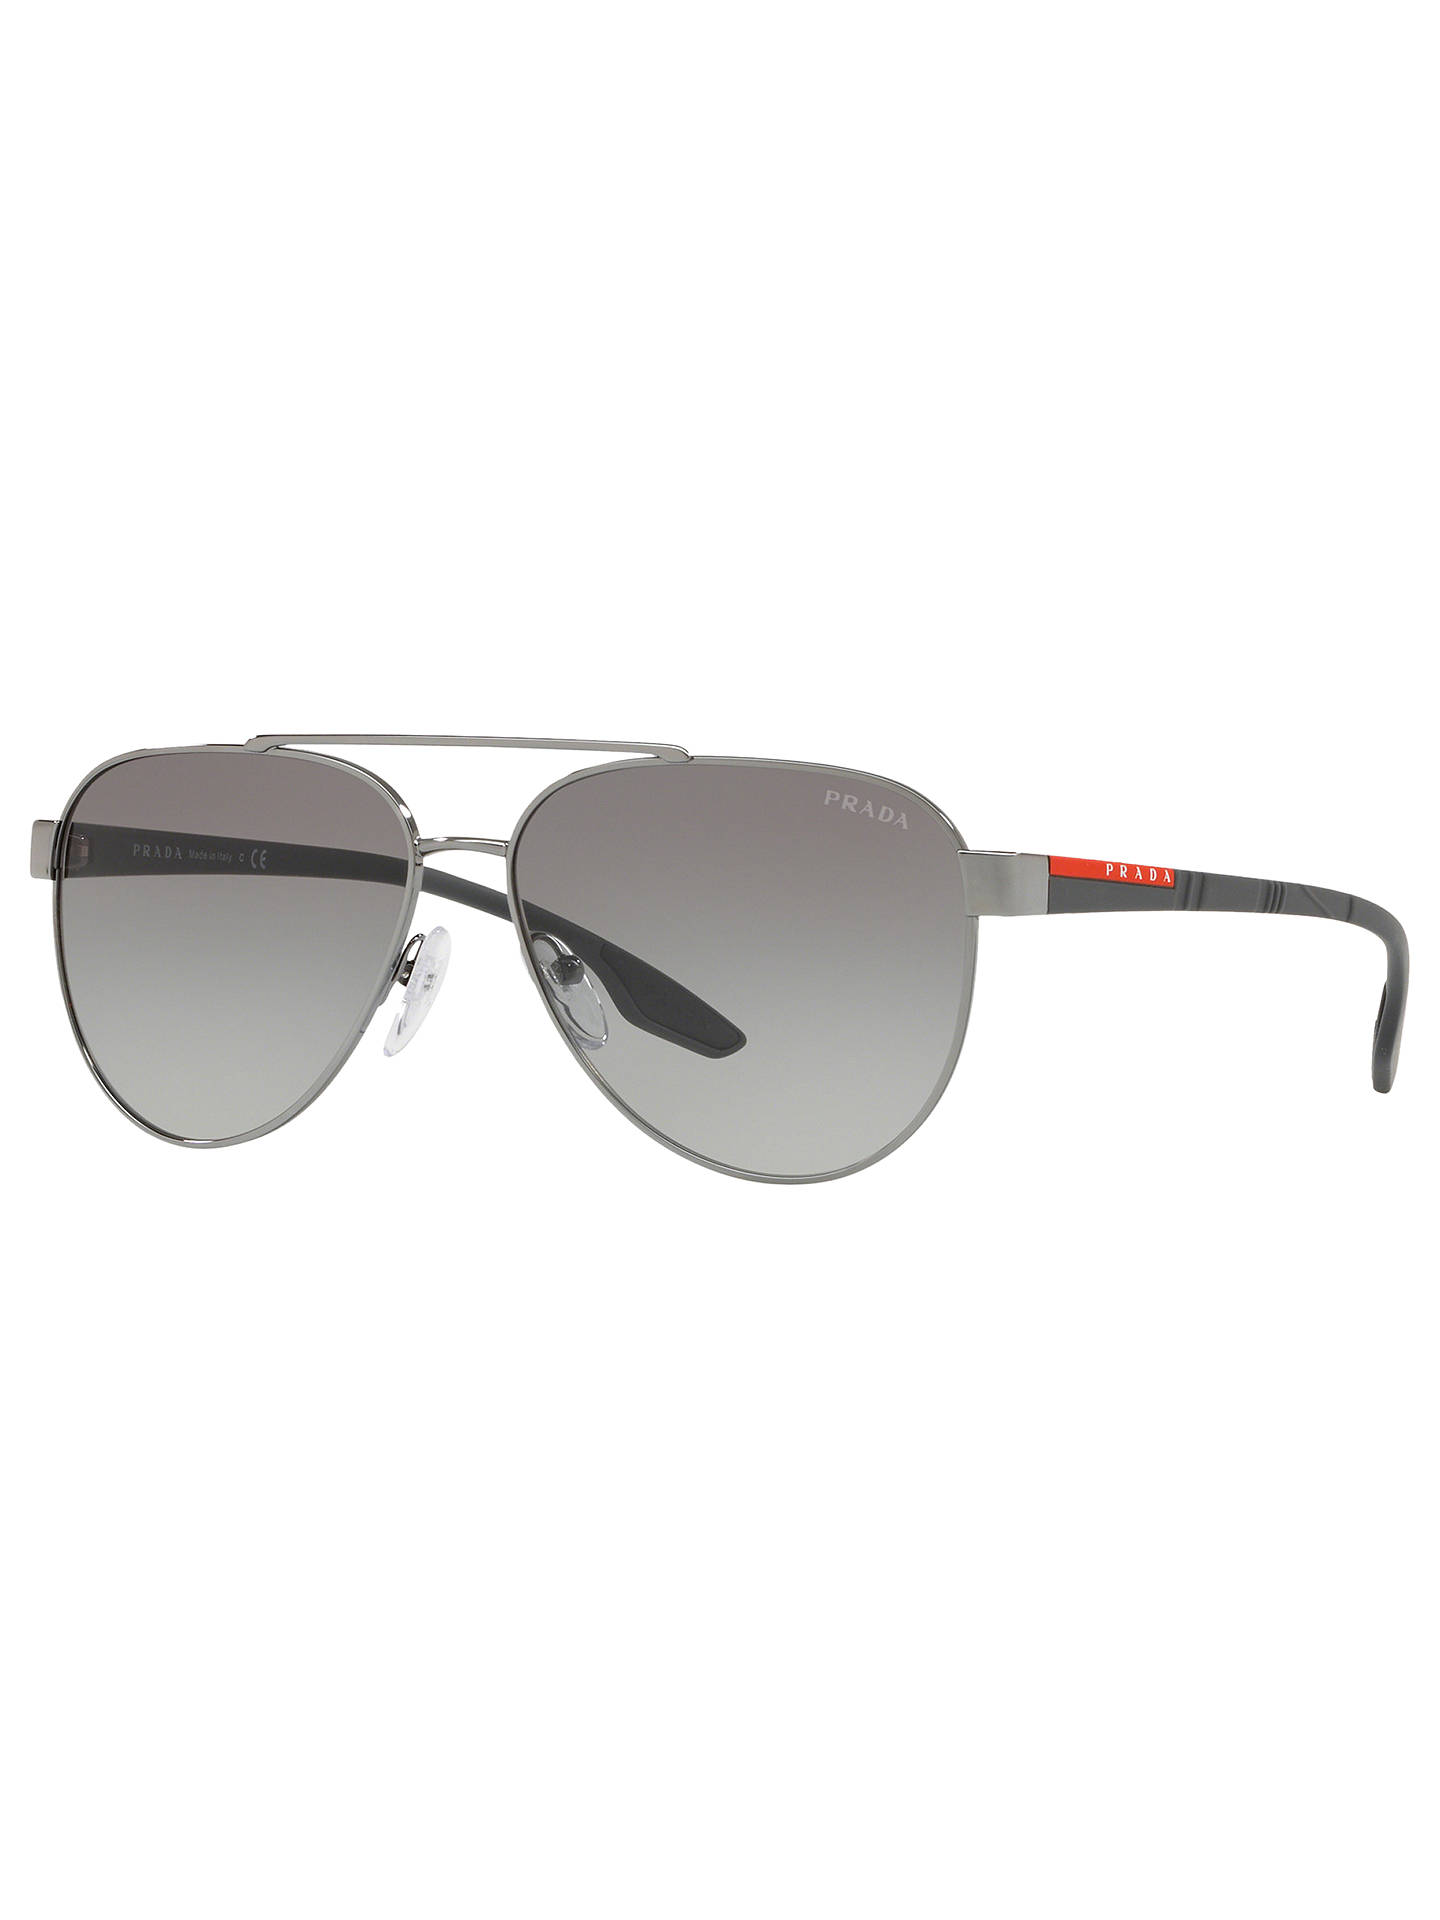 3c3c747ae9 Buy Prada Linea Rossa PS 54TS Men s Aviator Sunglasses